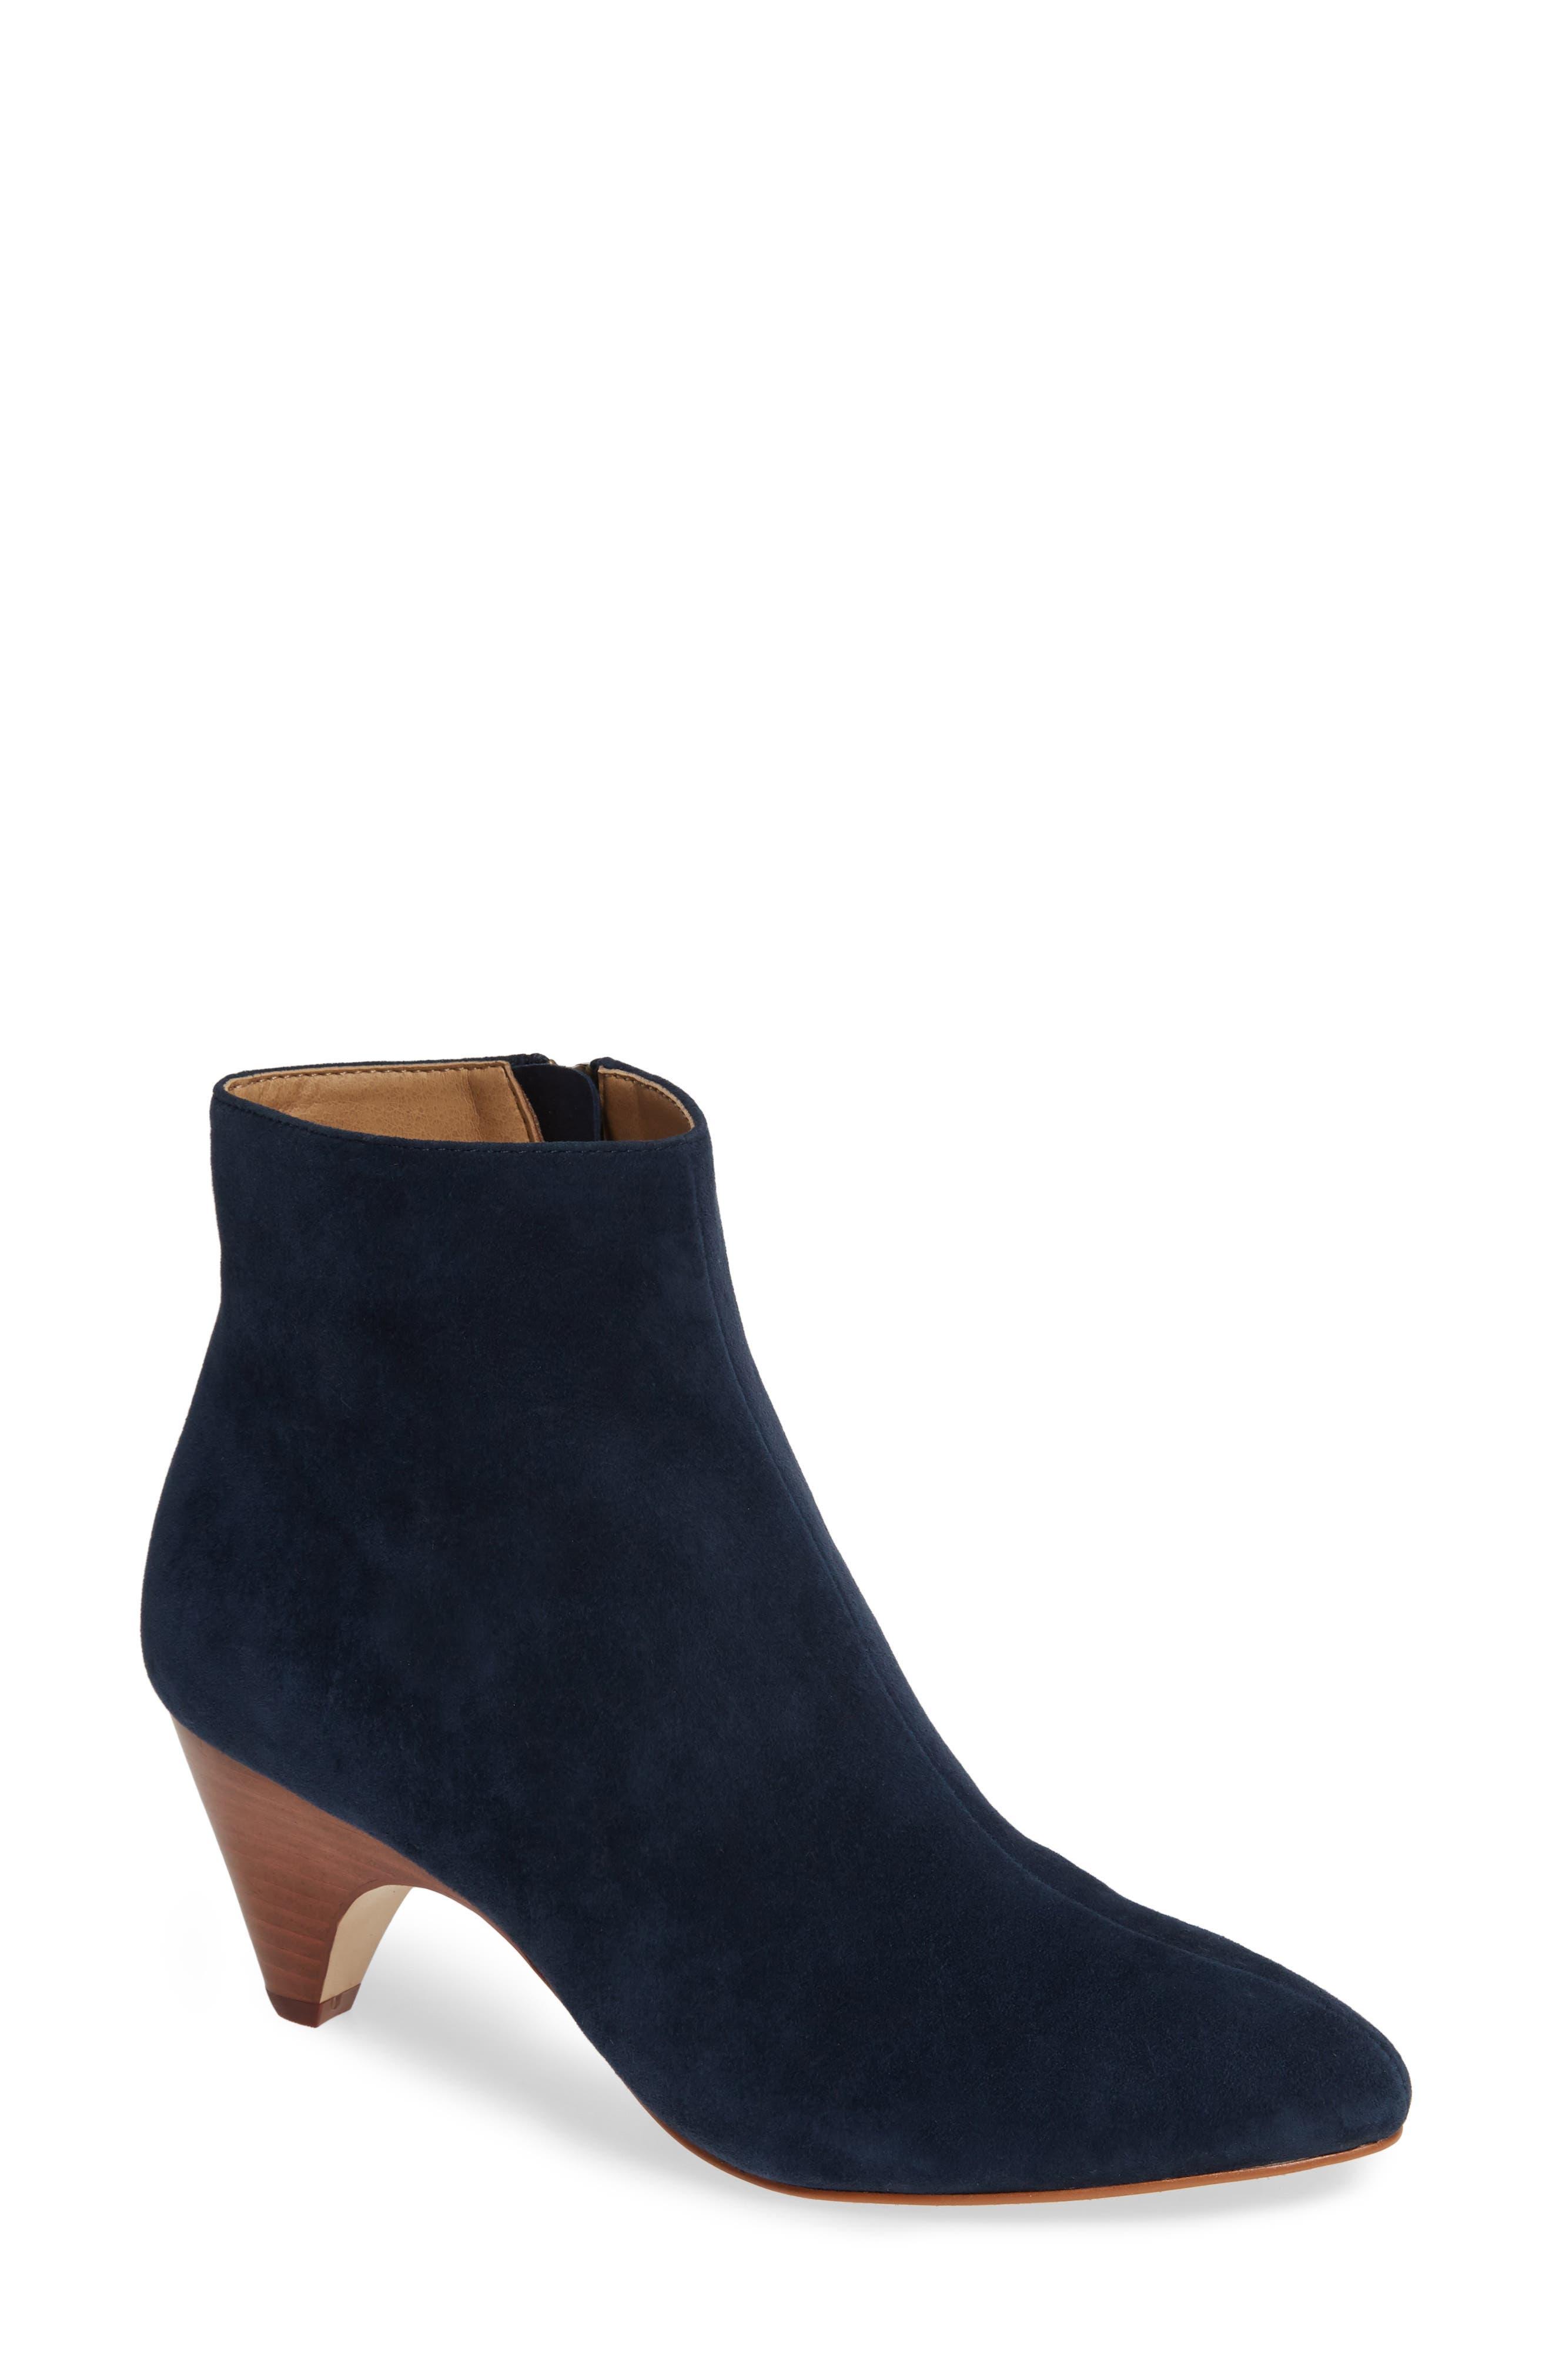 5b18e7600f8f Sale  Women s M4D3 Boots   Booties